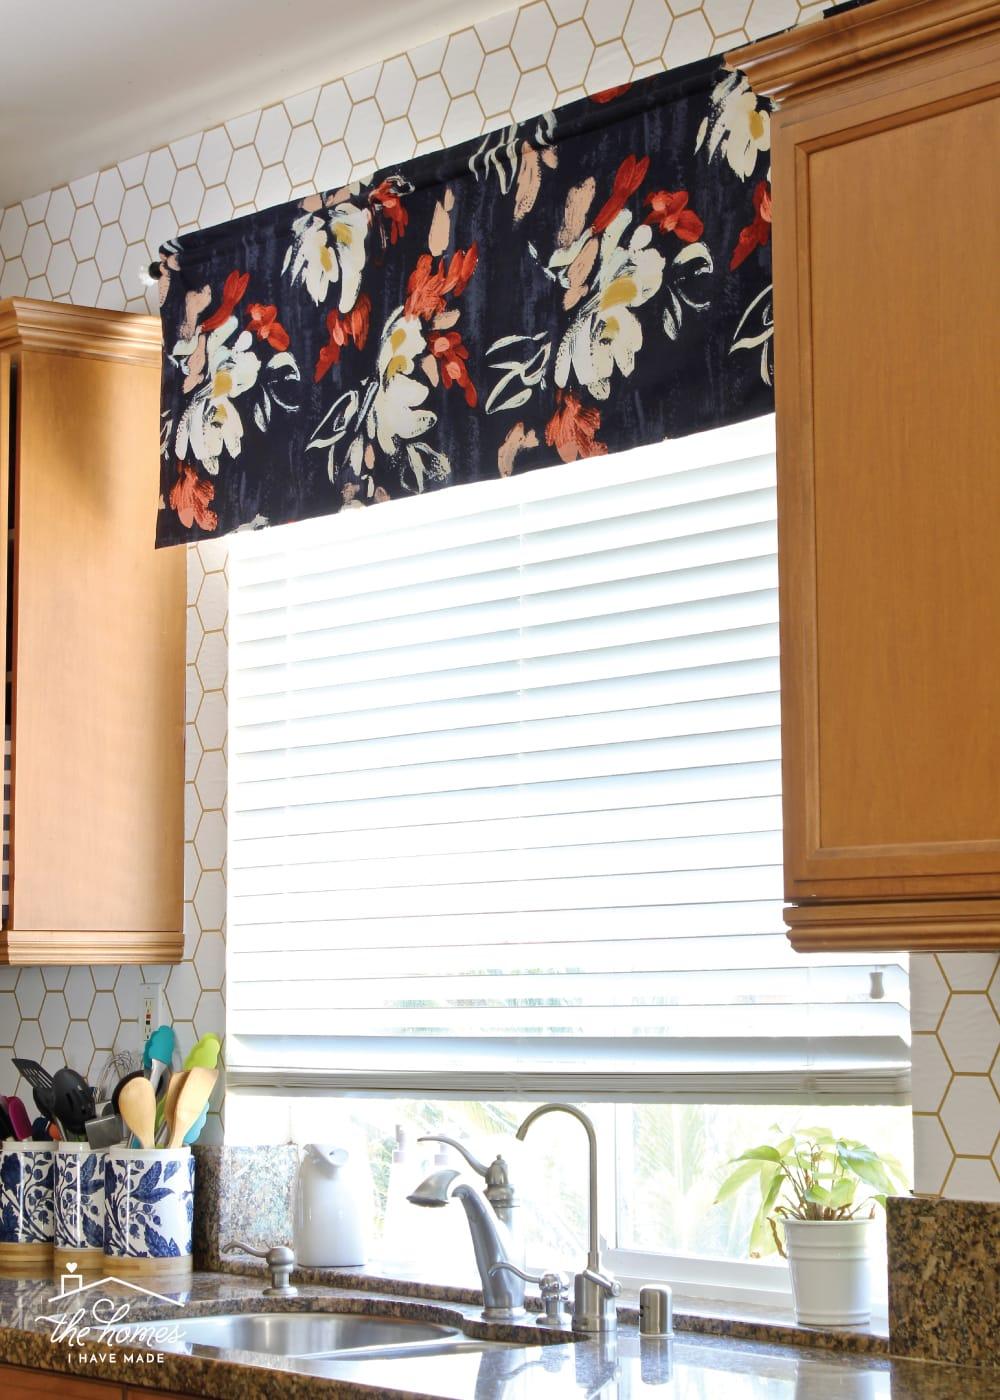 Window Treatment Patterns - Curtain Patterns, Valance Patterns